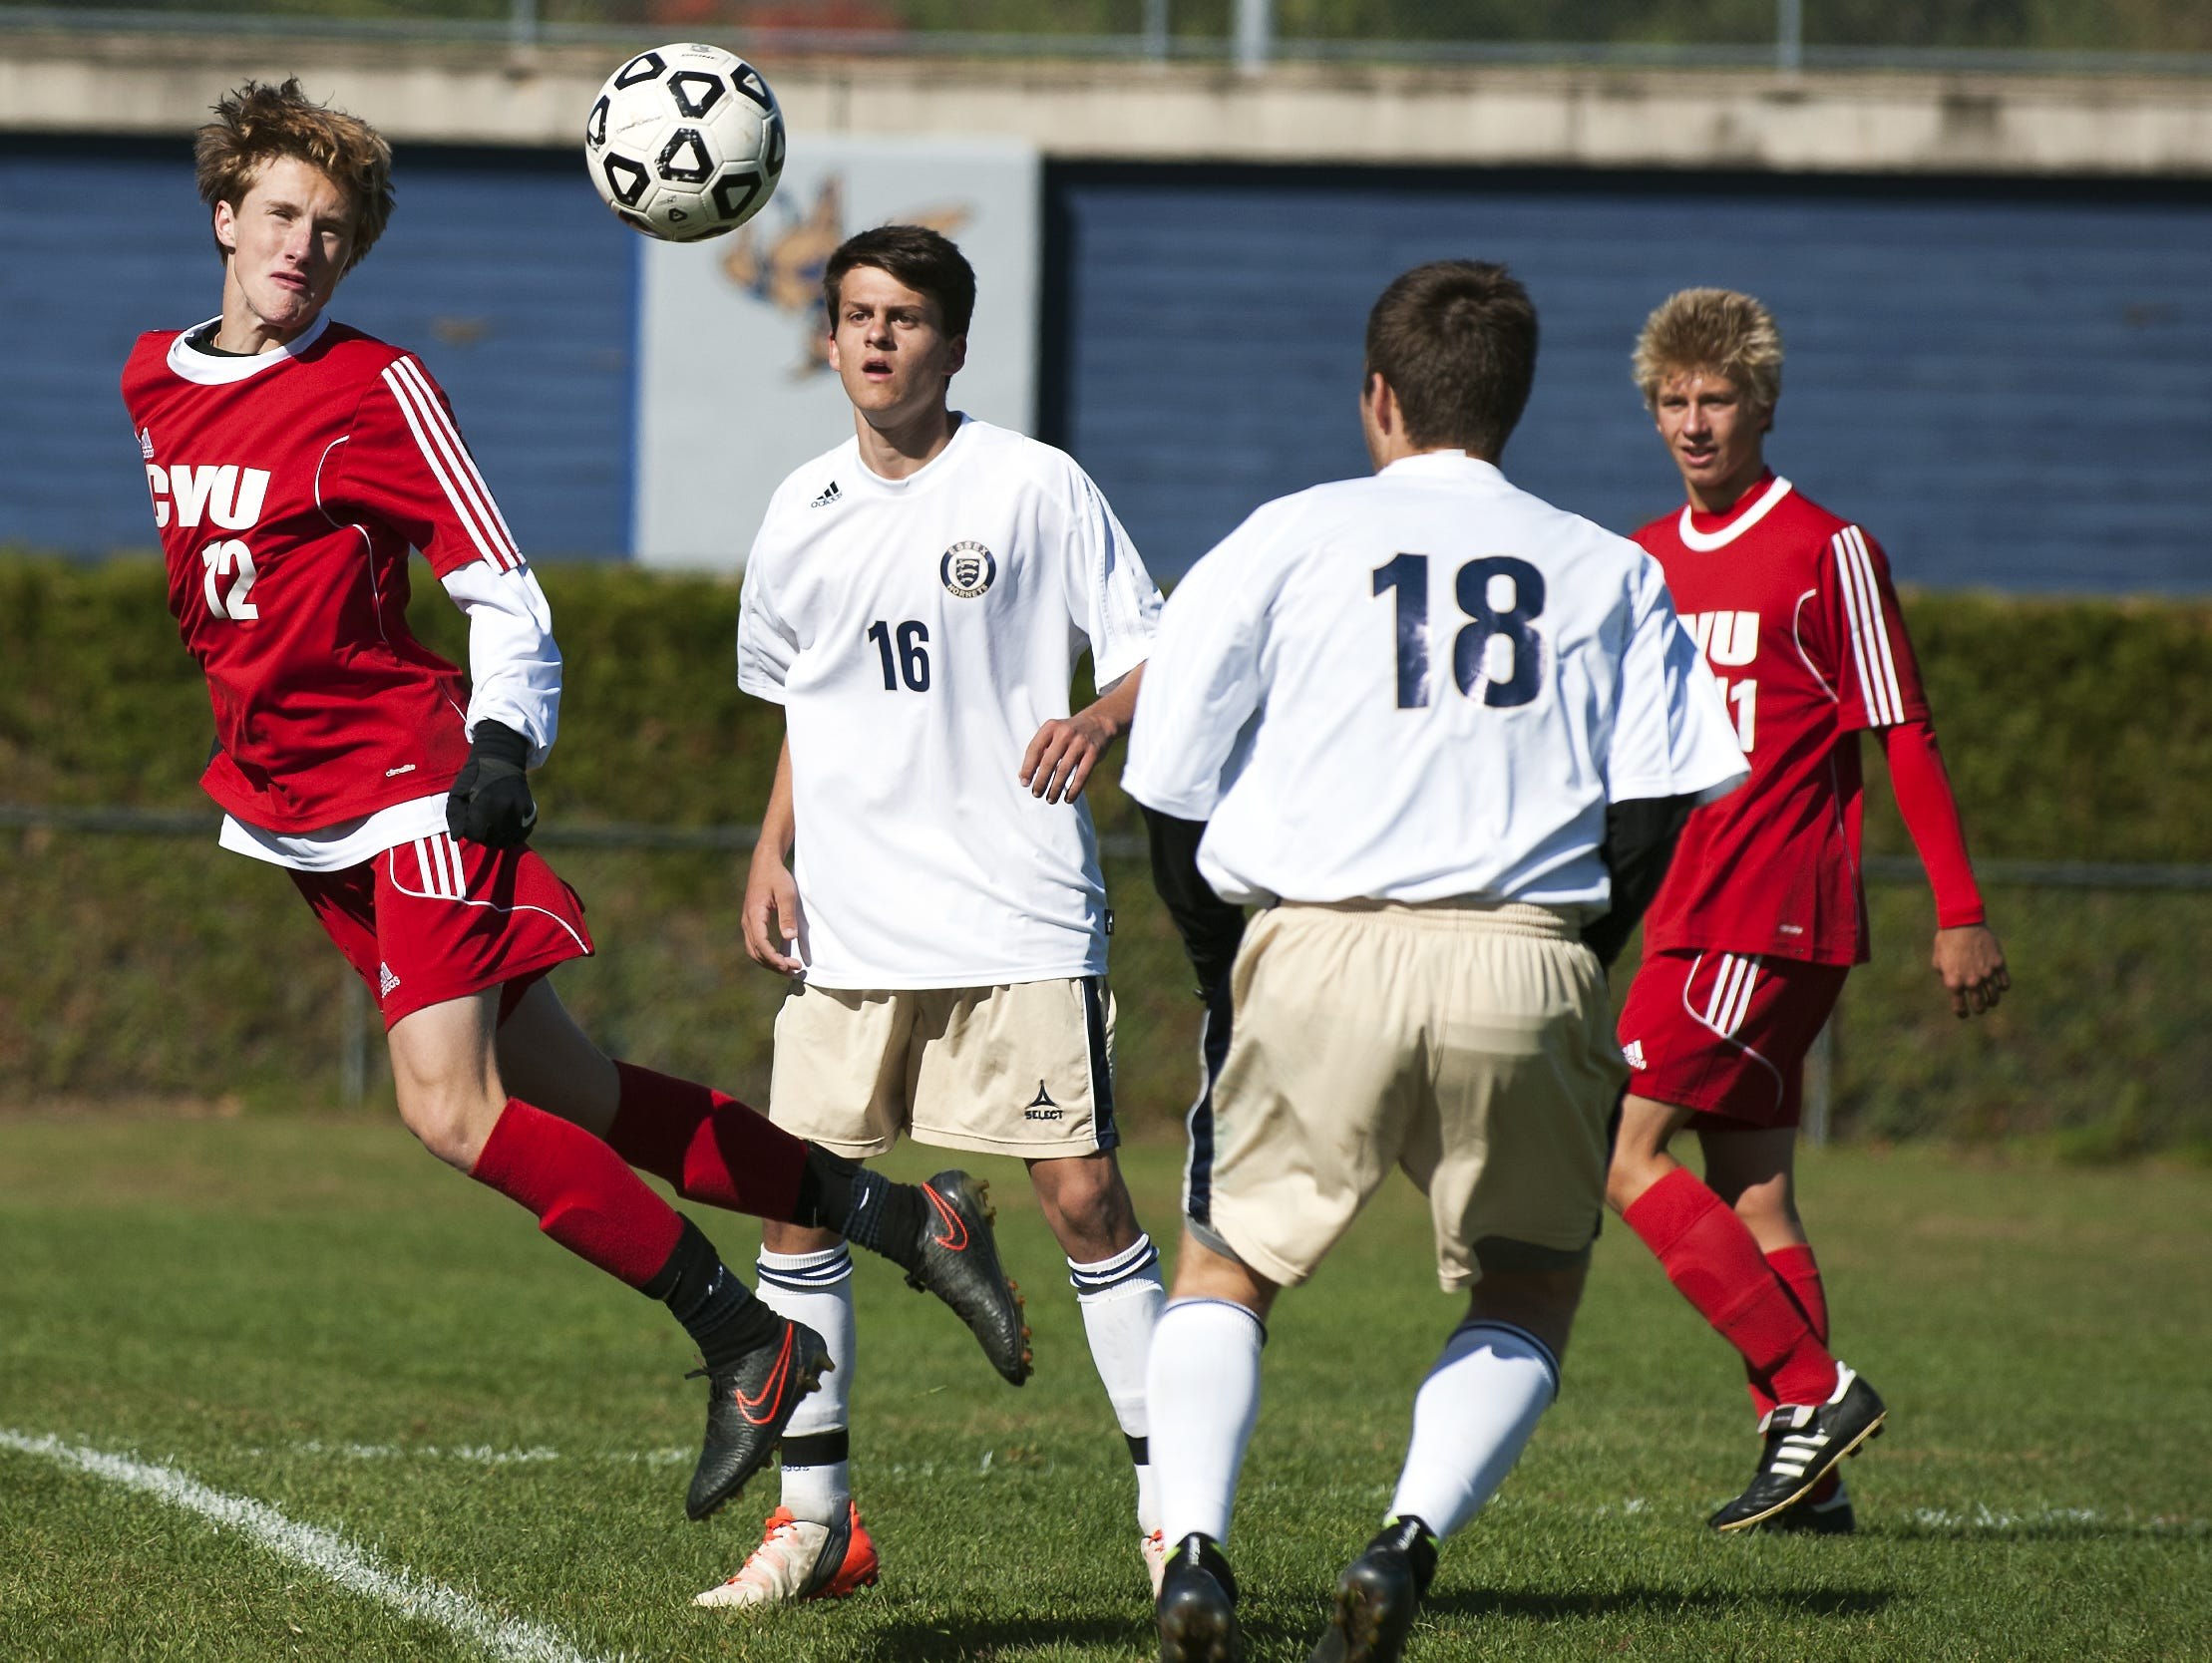 CVU's Joe Parento (12) heads the ball during a high school boys soccer game Saturday.